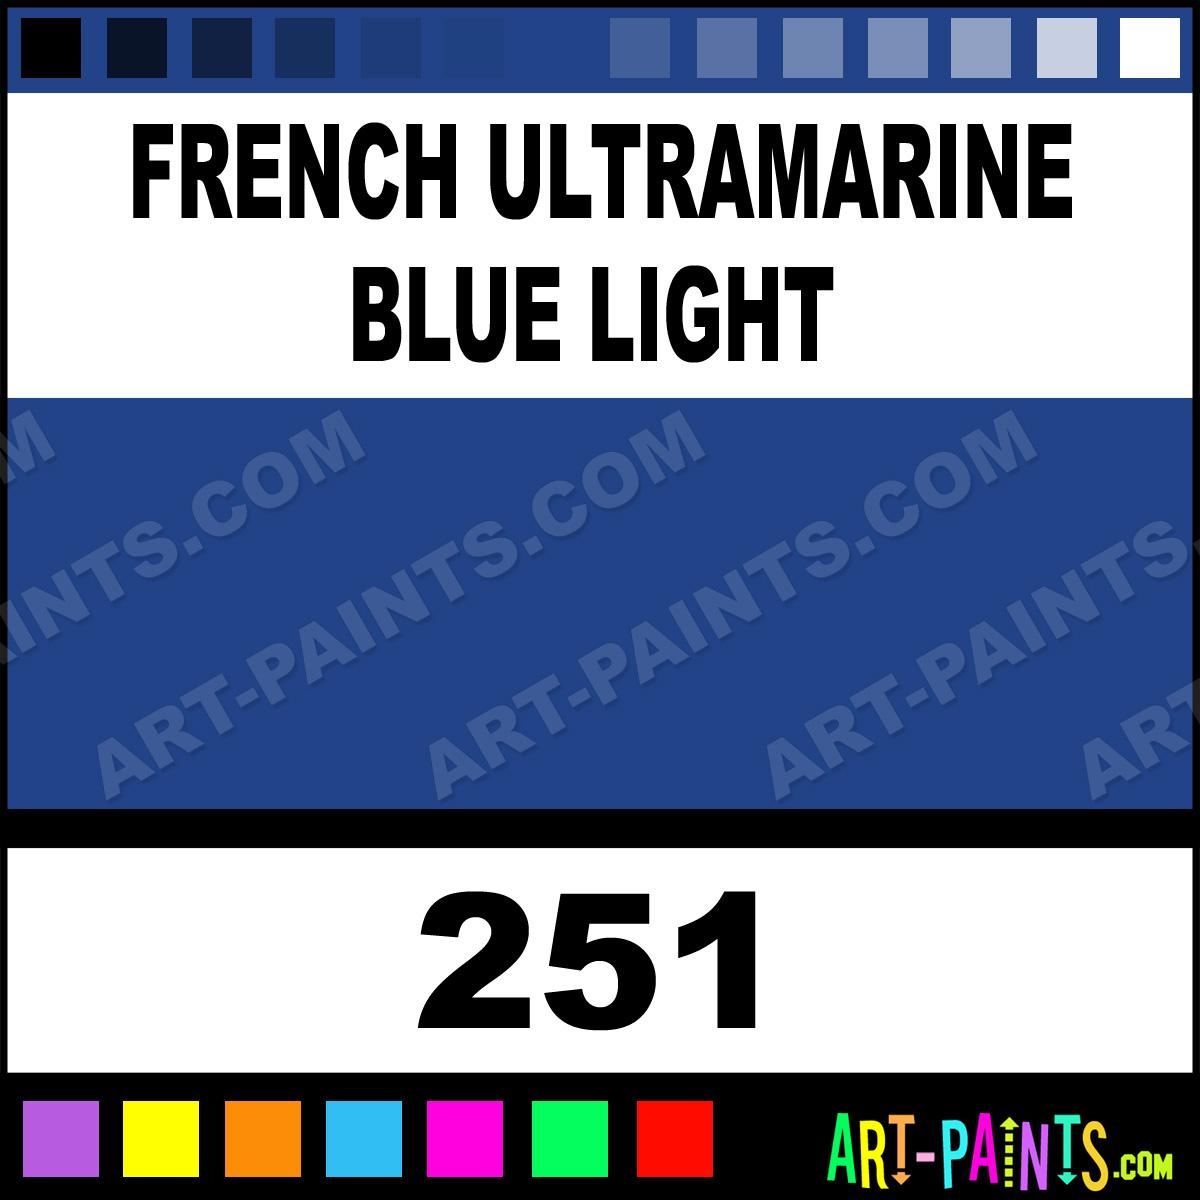 French Ultramarine Blue Light Aquarelle Watercolor Paints